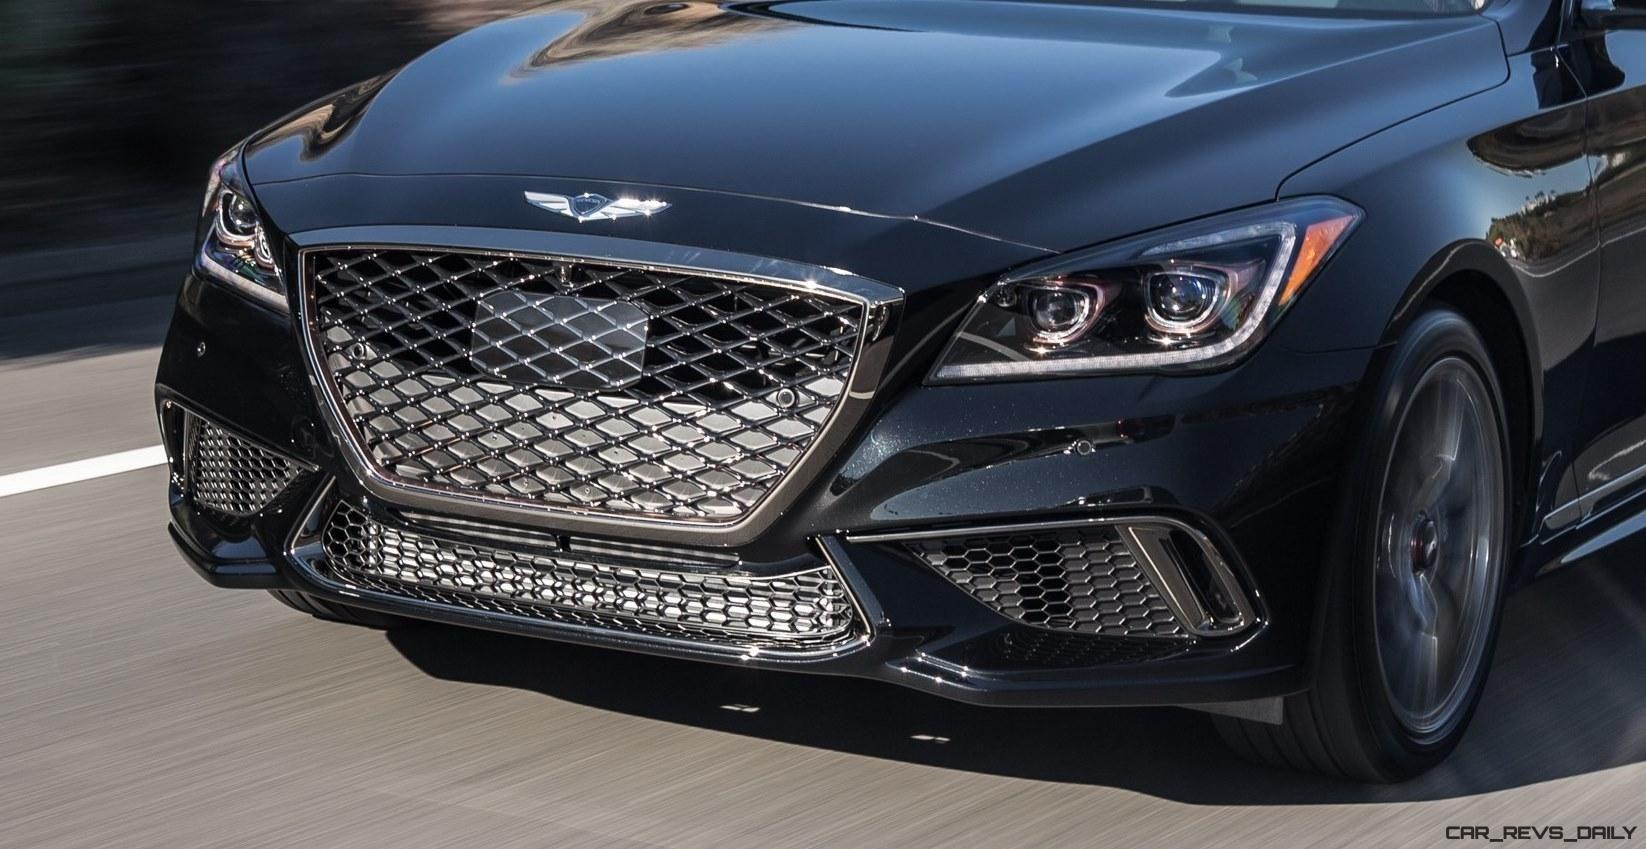 2018 Genesis G80 Sport Shows New Style, V6TT